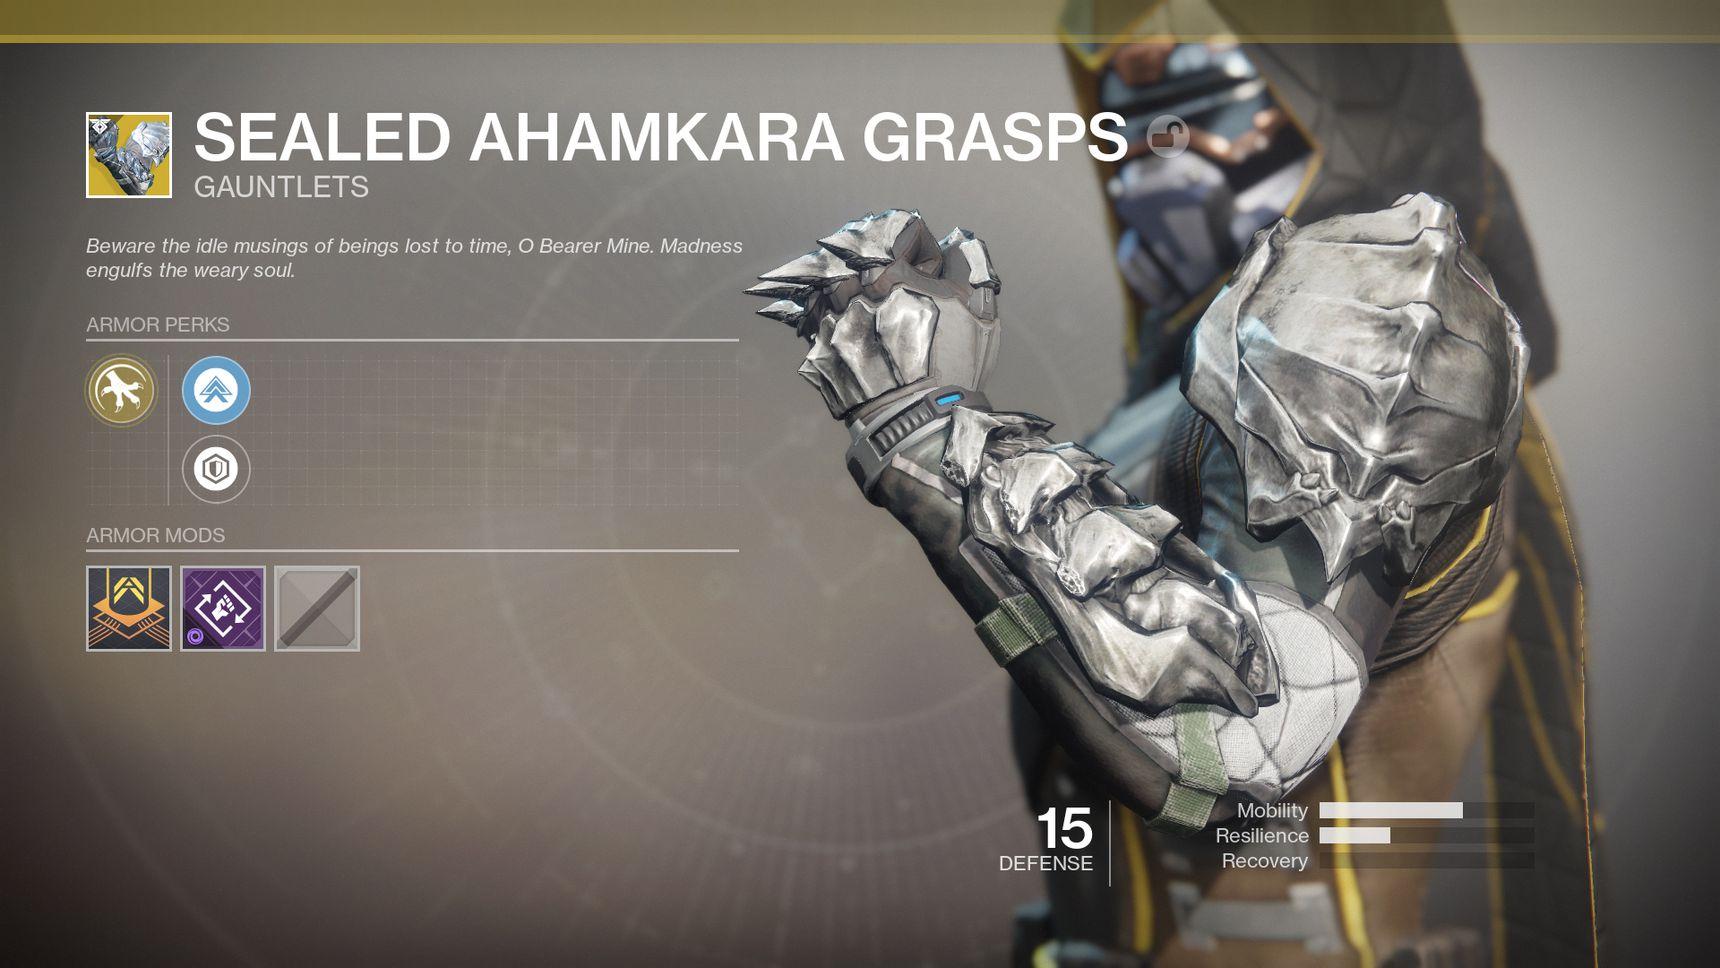 D2_DLC2_Hunter_Sealed_Ahamkara_Grasps